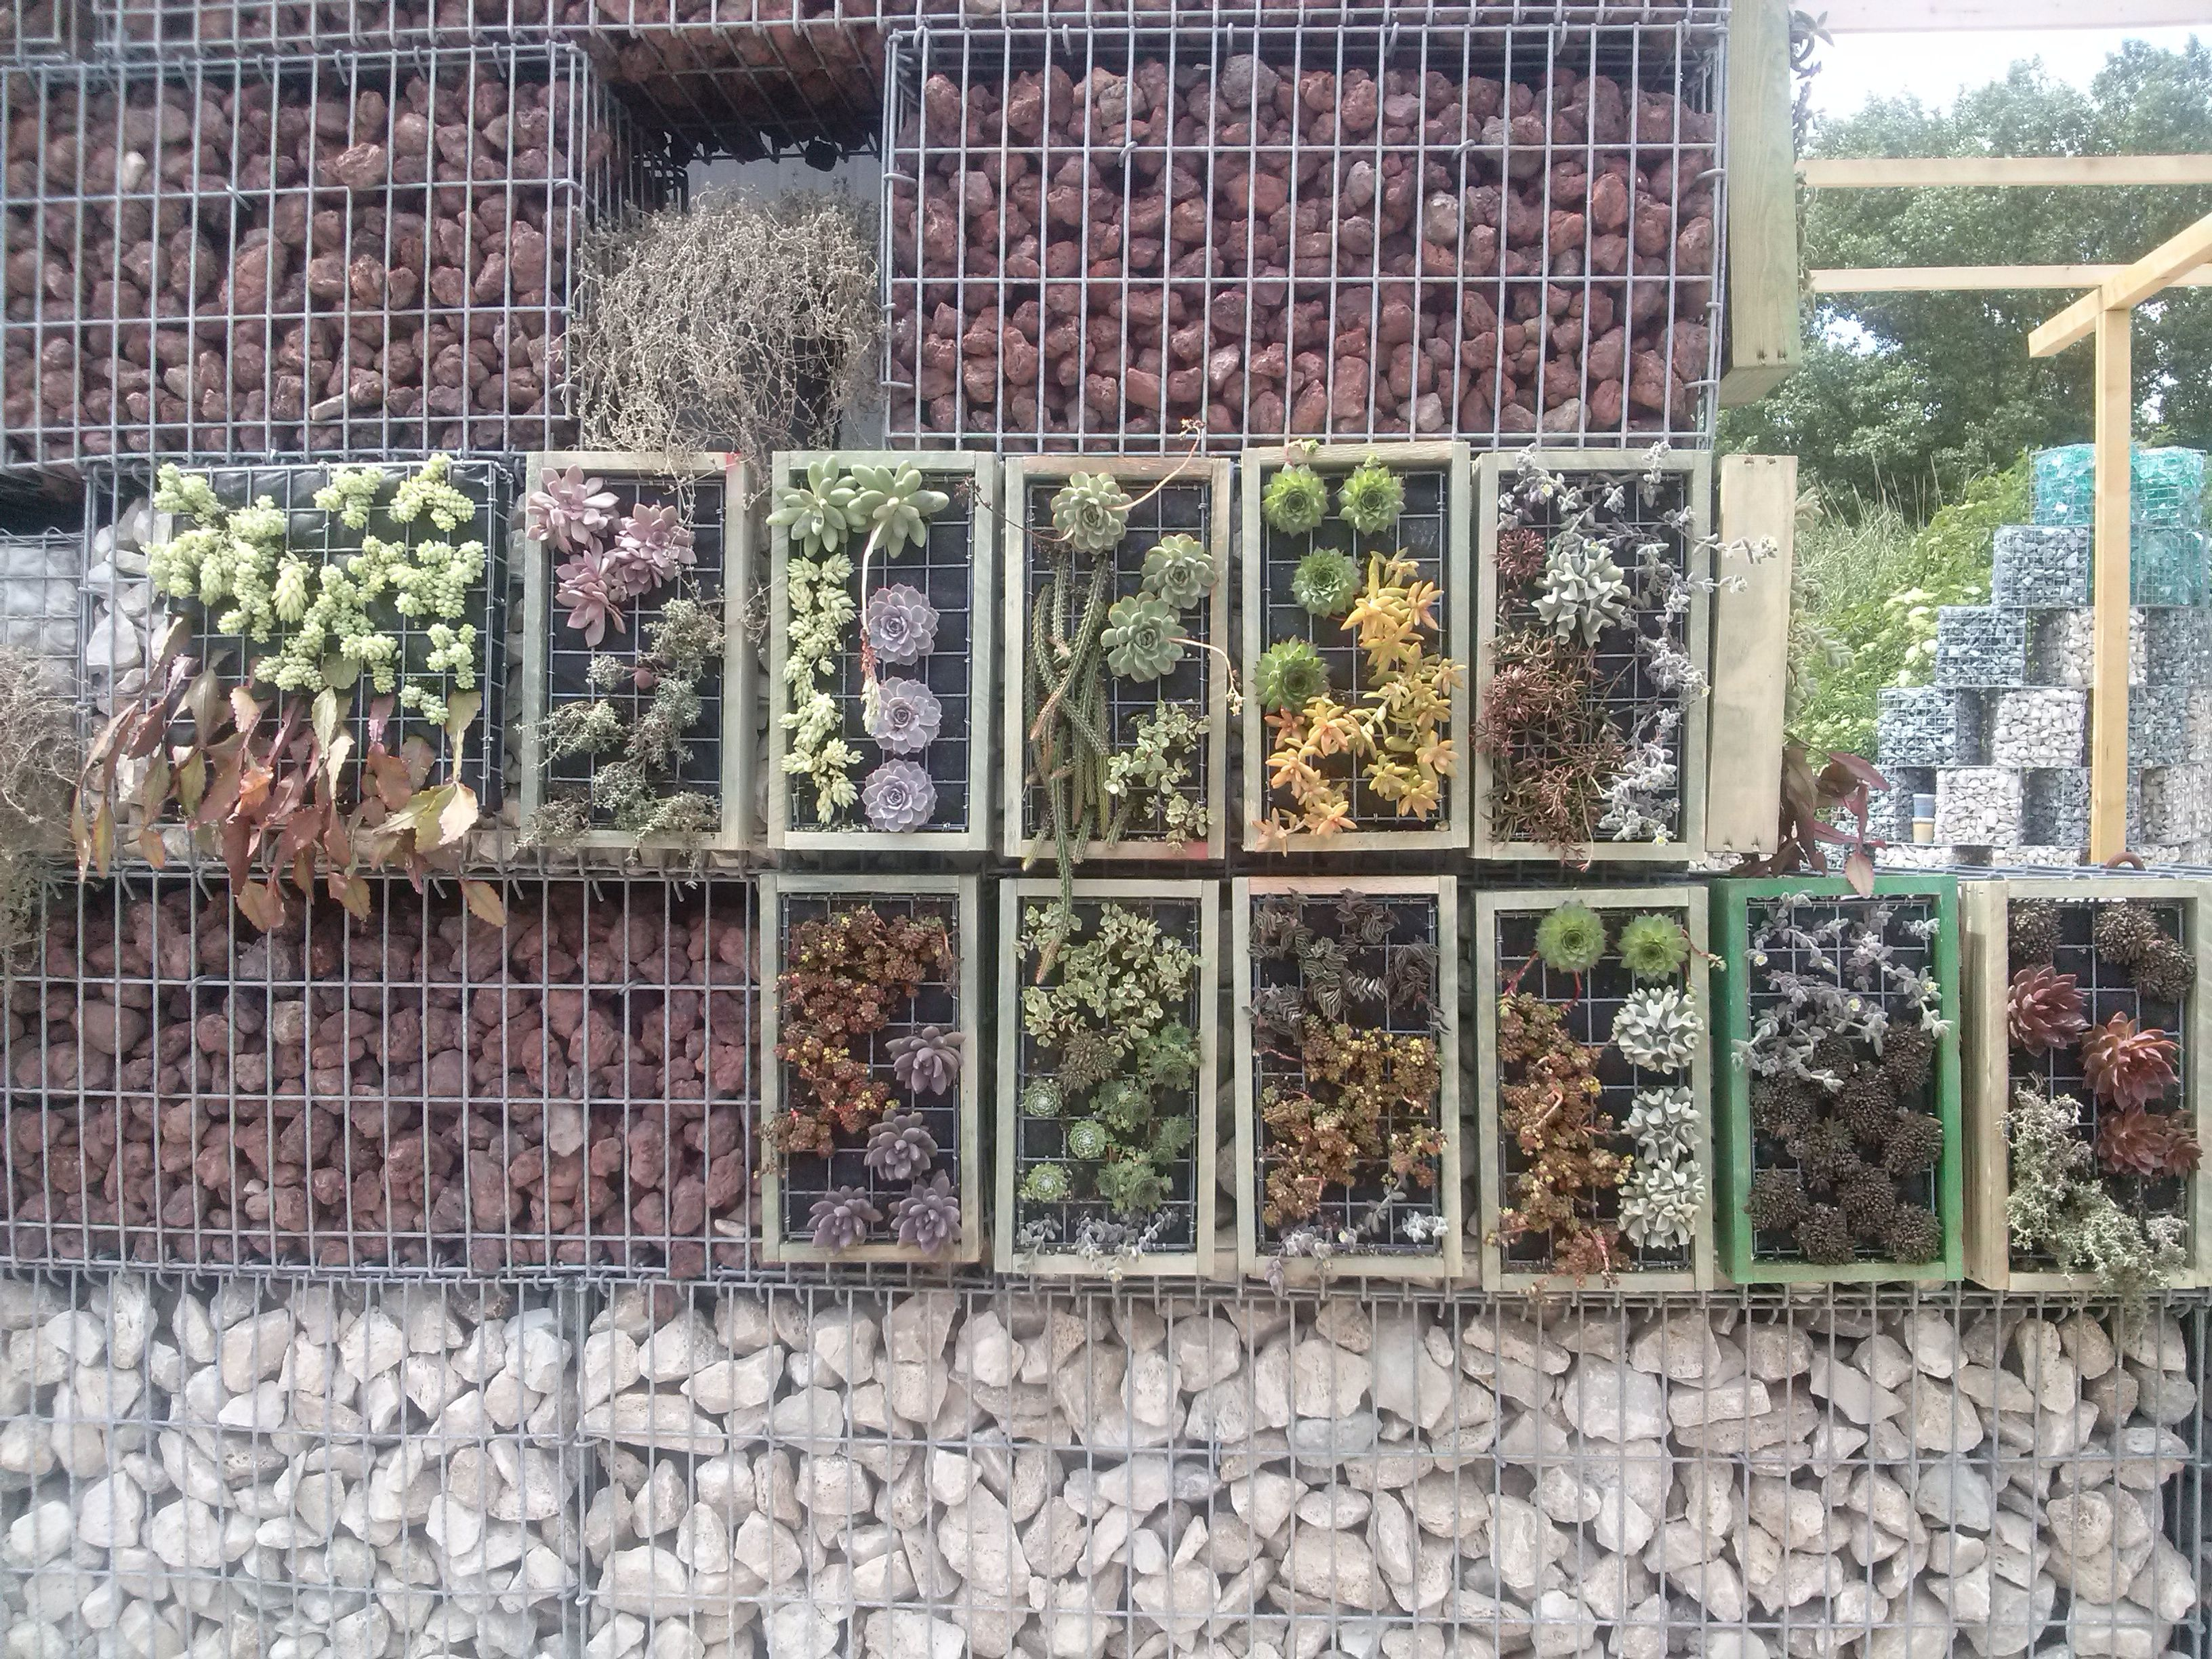 Vendita Moduli Giardino Verticale Tivoli Roma Giardini